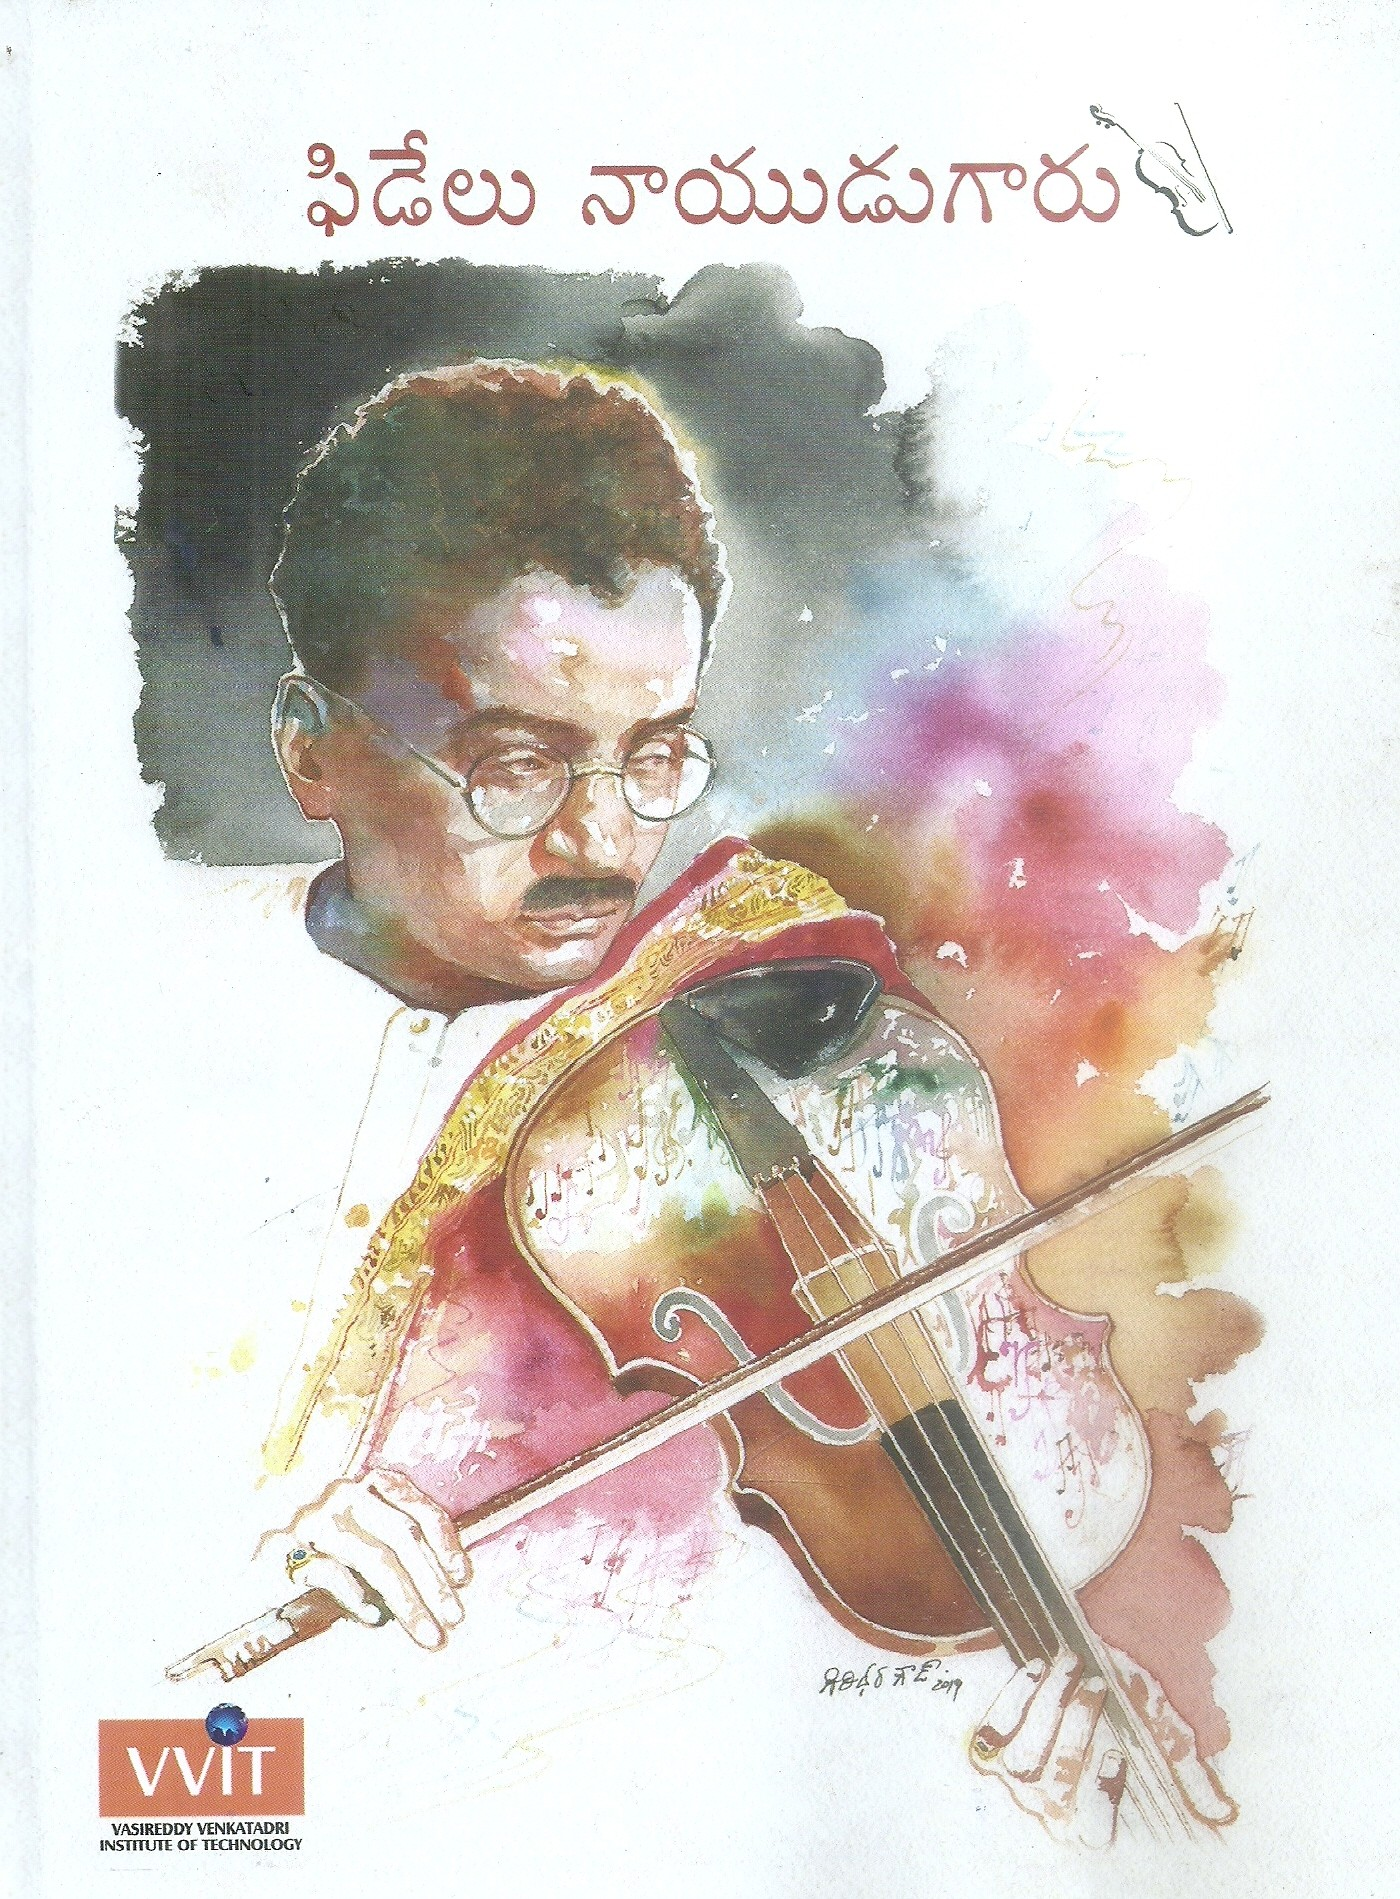 Phidelu Nayudu Garu